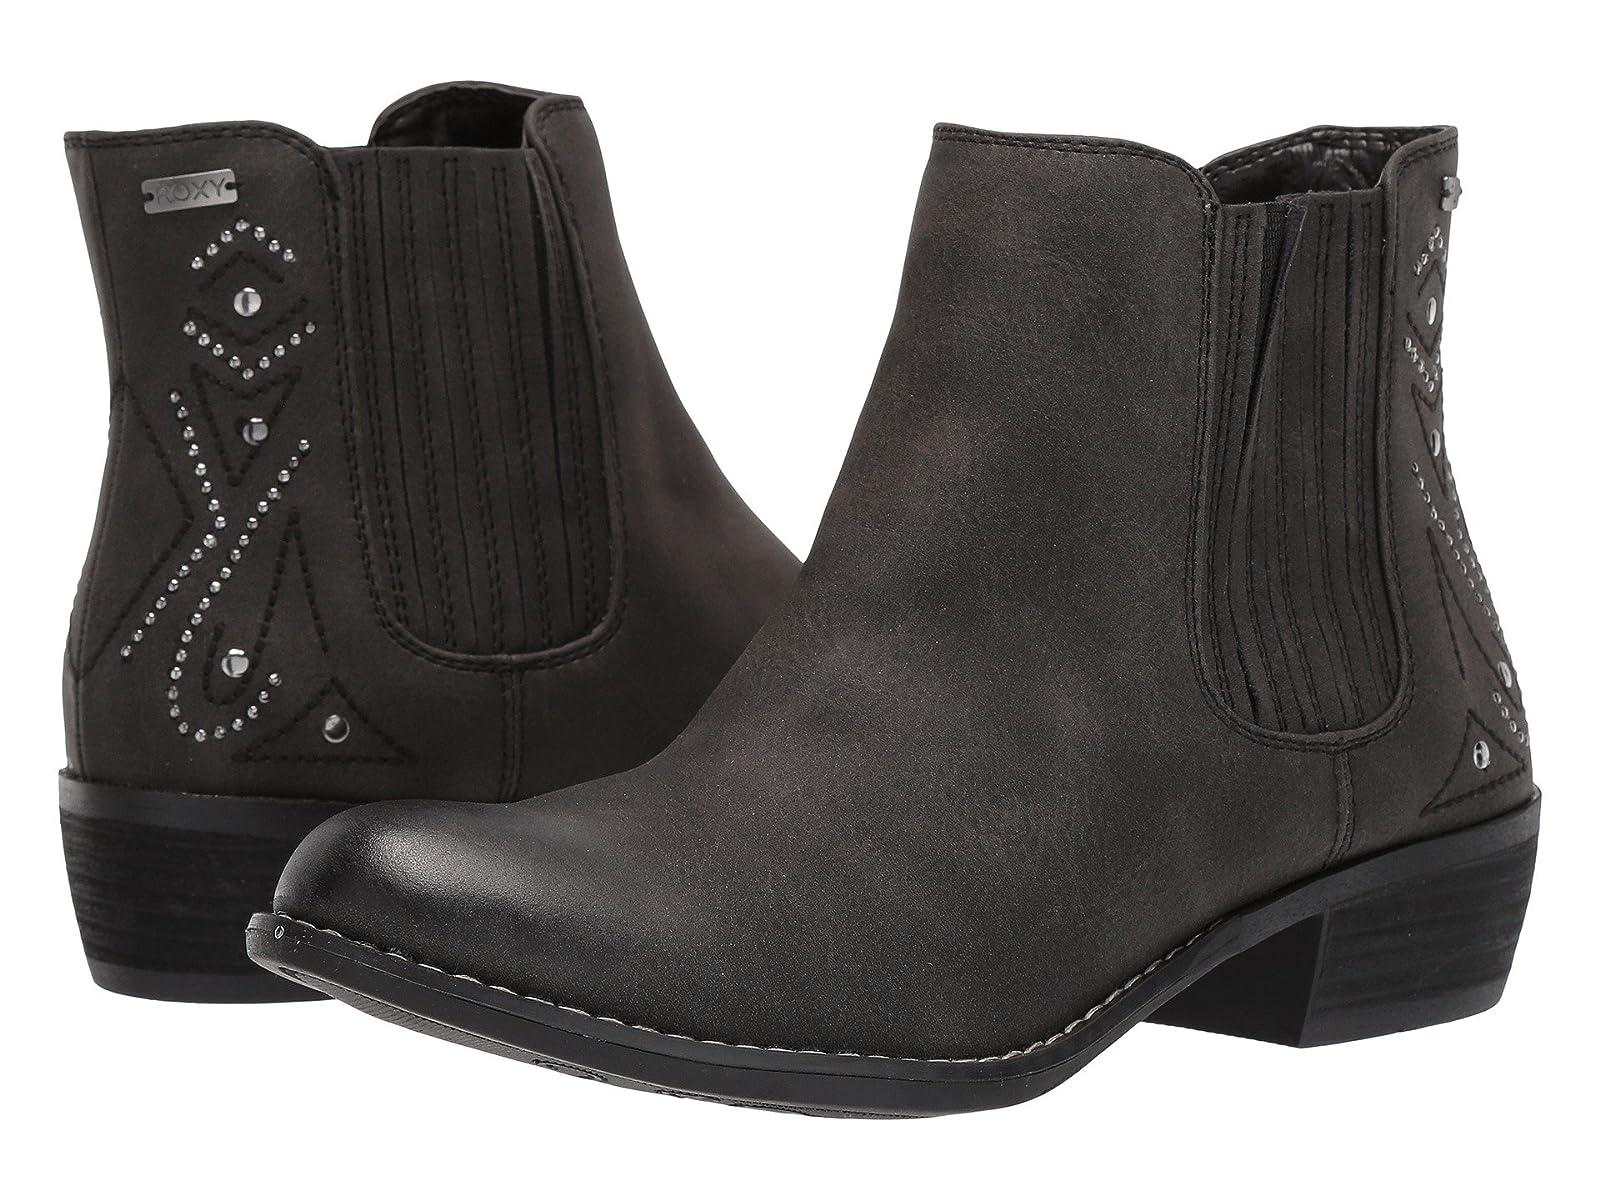 Roxy PasoCheap and distinctive eye-catching shoes